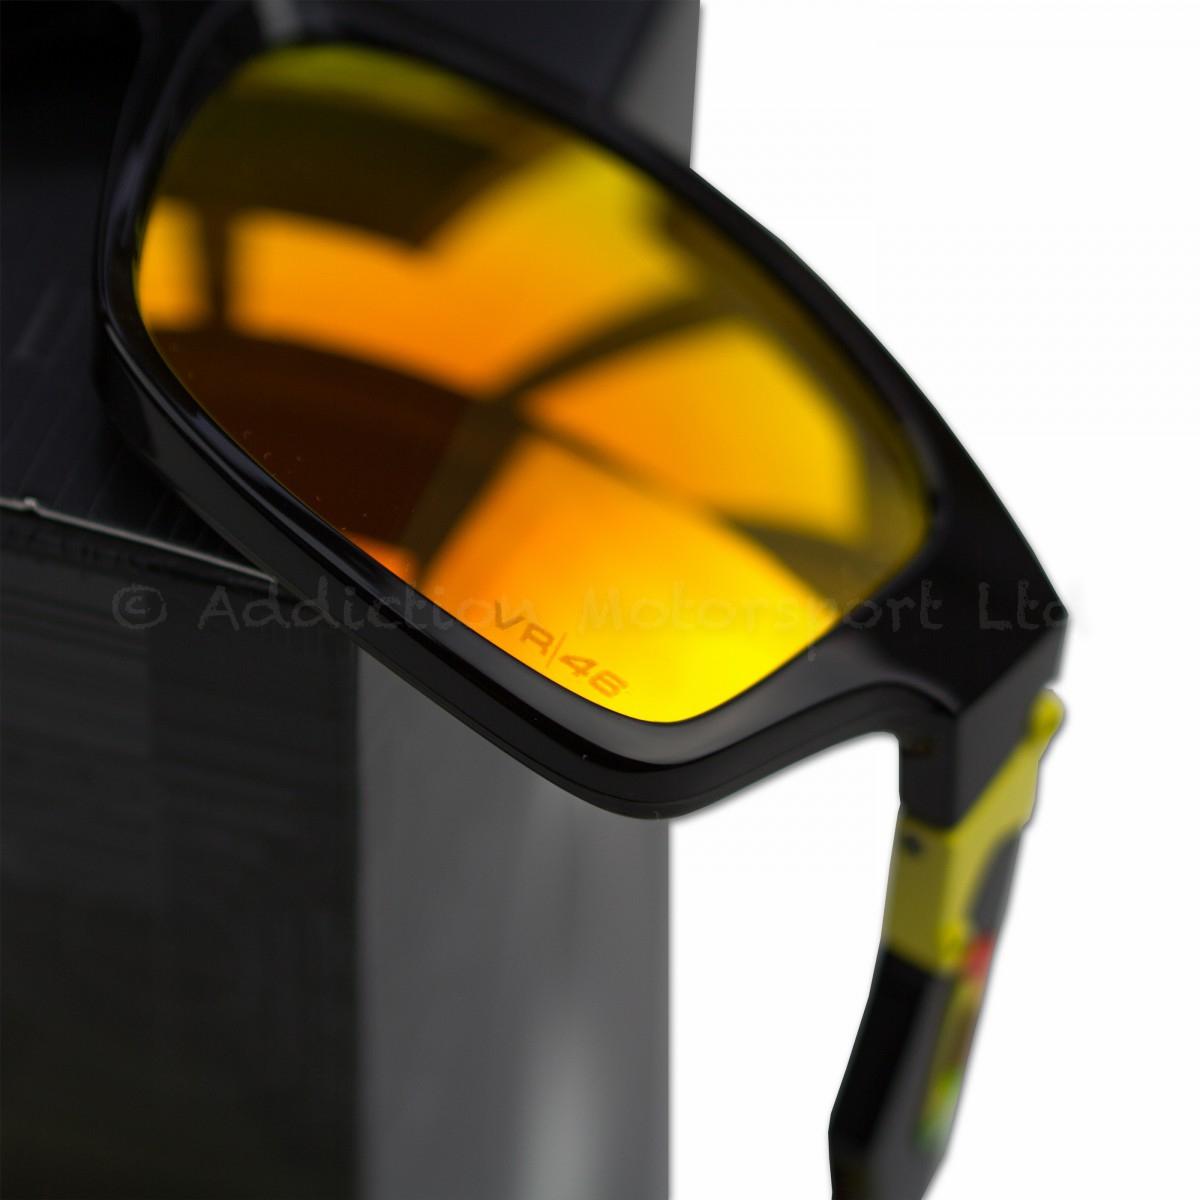 c232d741c0 ... australia oakley jupiter valentino rossi signature vr46 series motogp  sunglasses 0o9135 11 e3745 e7c2f